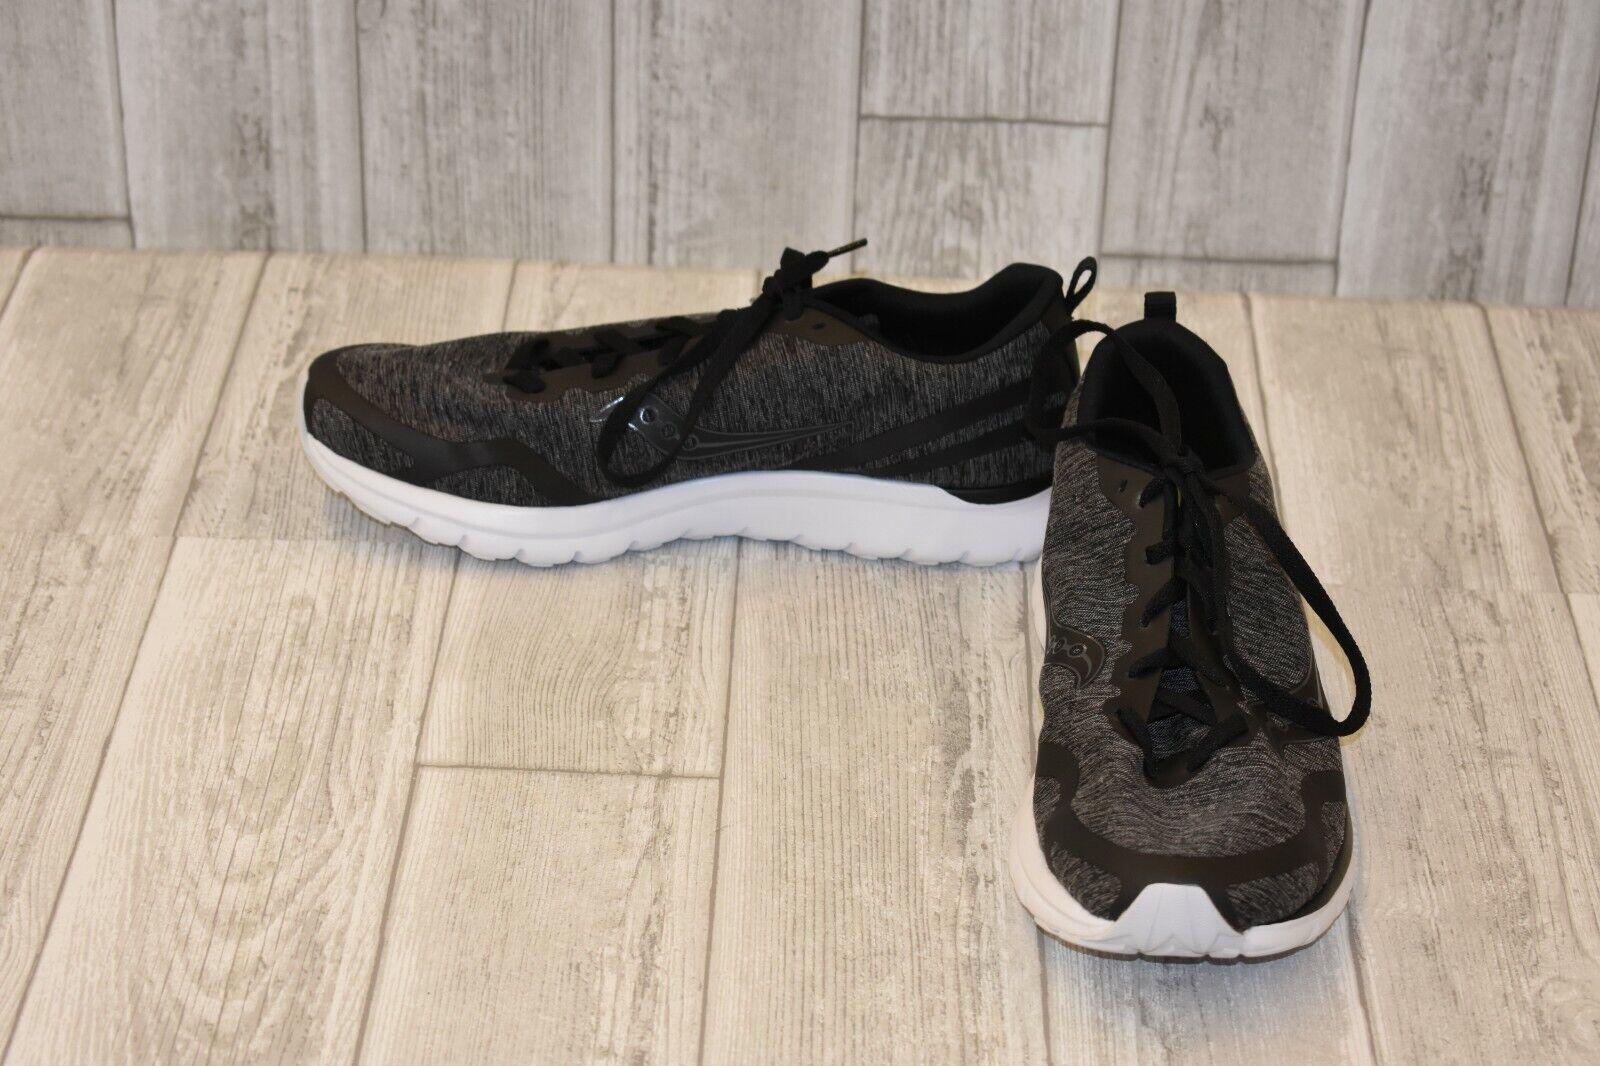 62eadd1a35ab9 Saucony Liteform Feel Men's Running Cross Trainning Sneaker Black Size 11